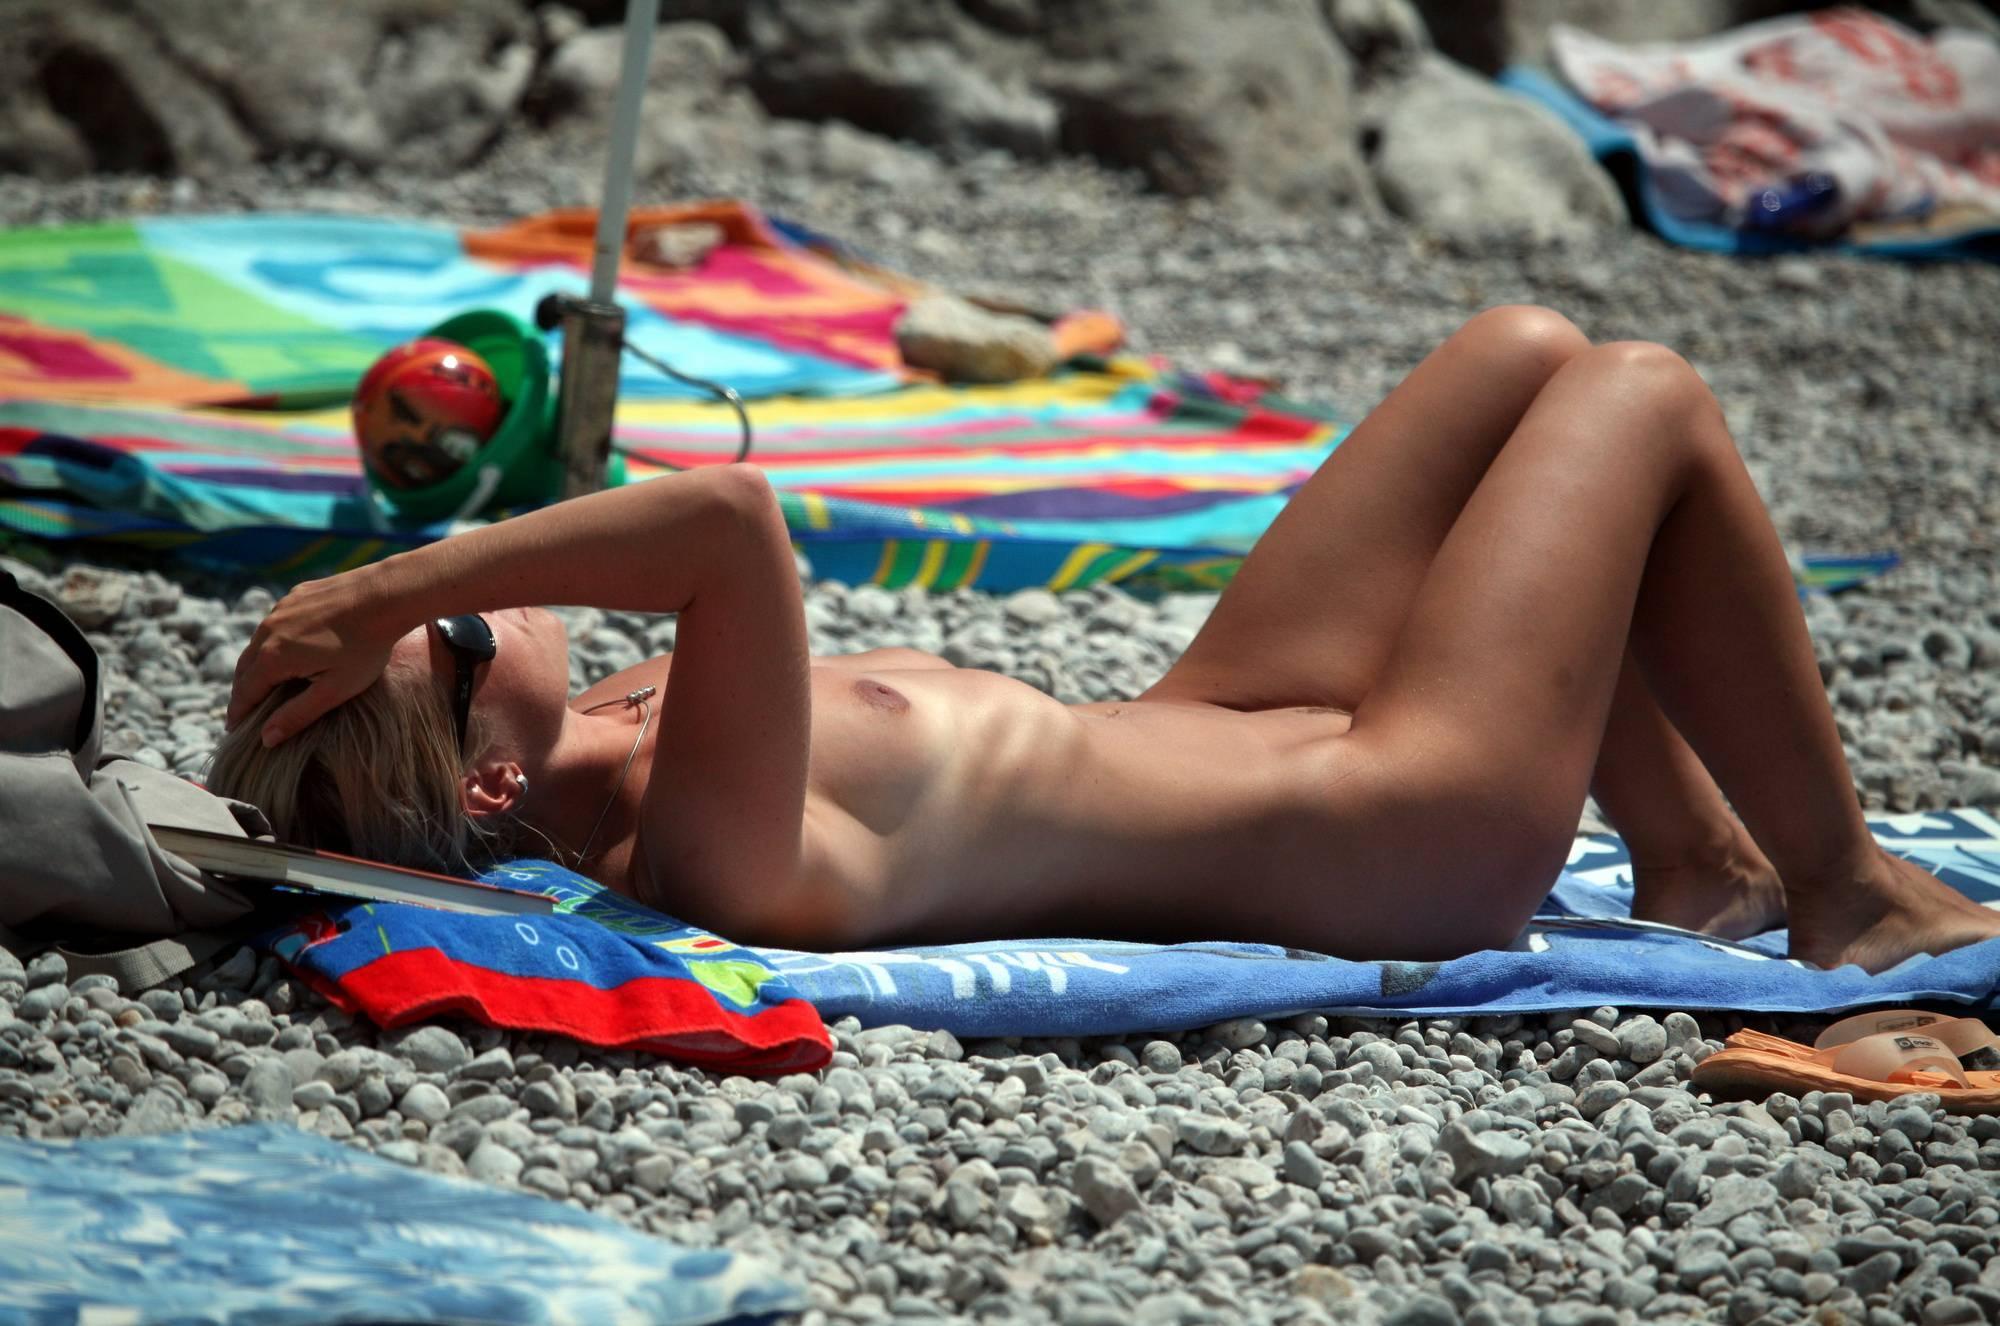 Nudist Beach Photo Tour - 2